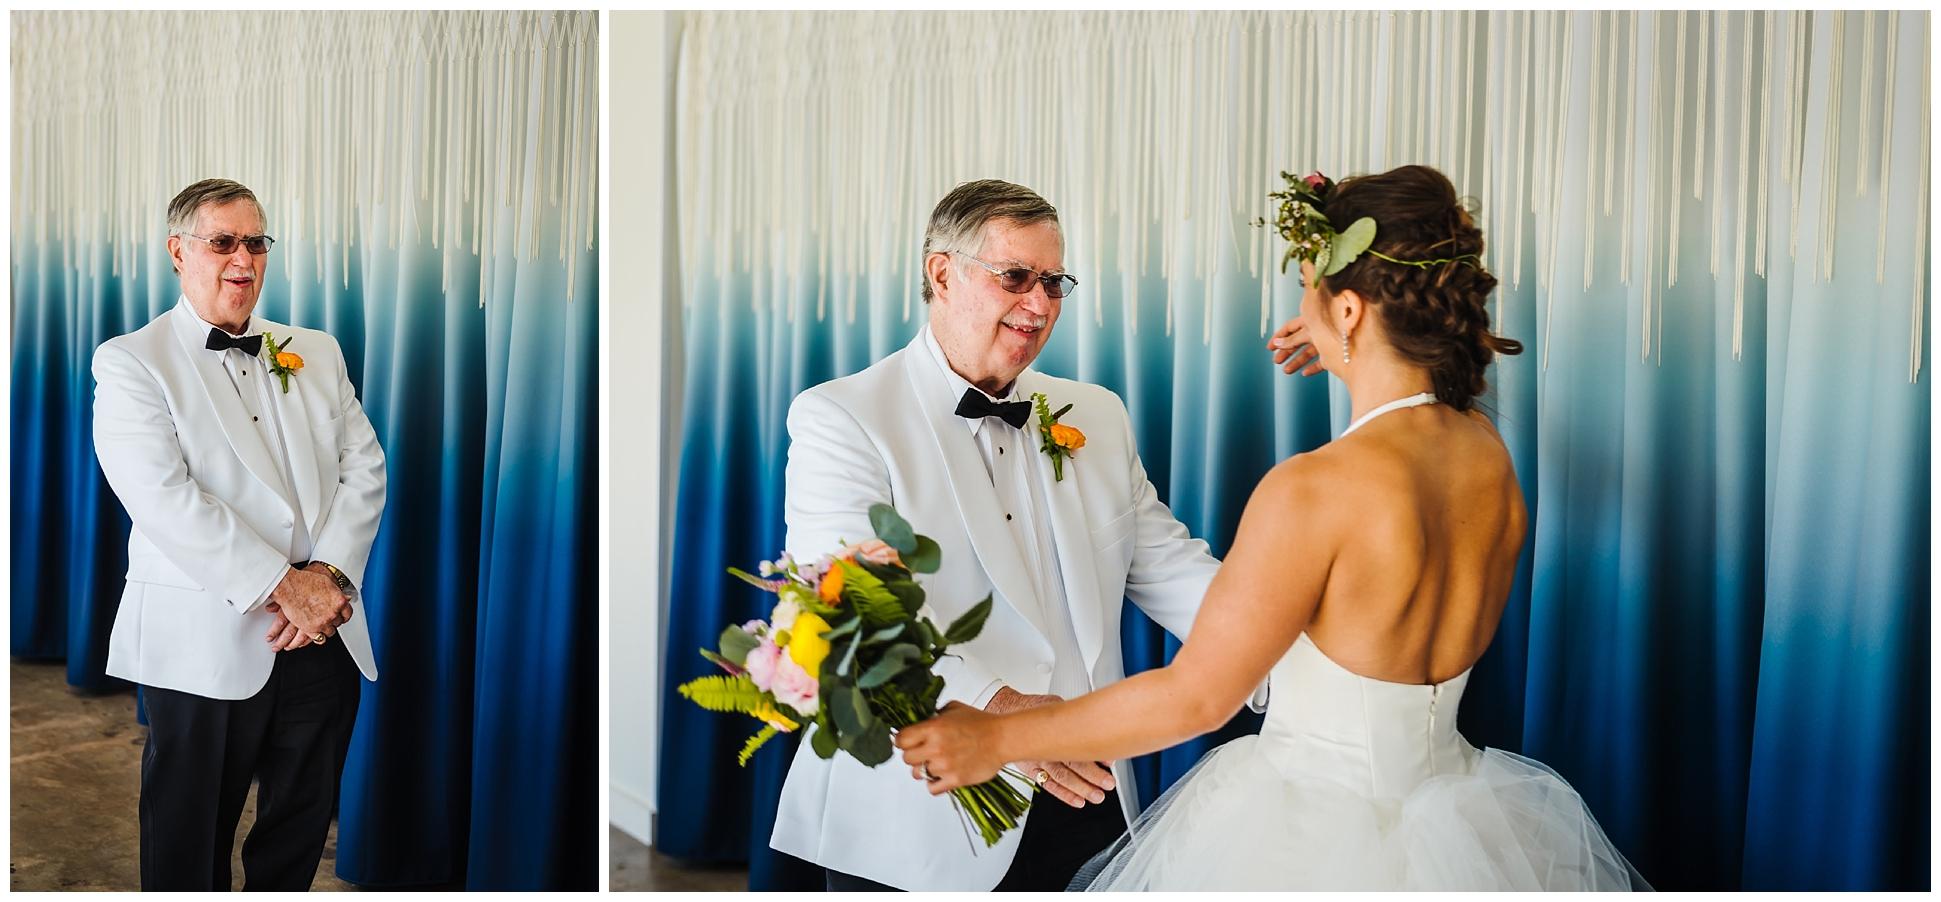 Tampa-wedding-photographer-vera-wang-flower-crown-post-card-inn_0014.jpg